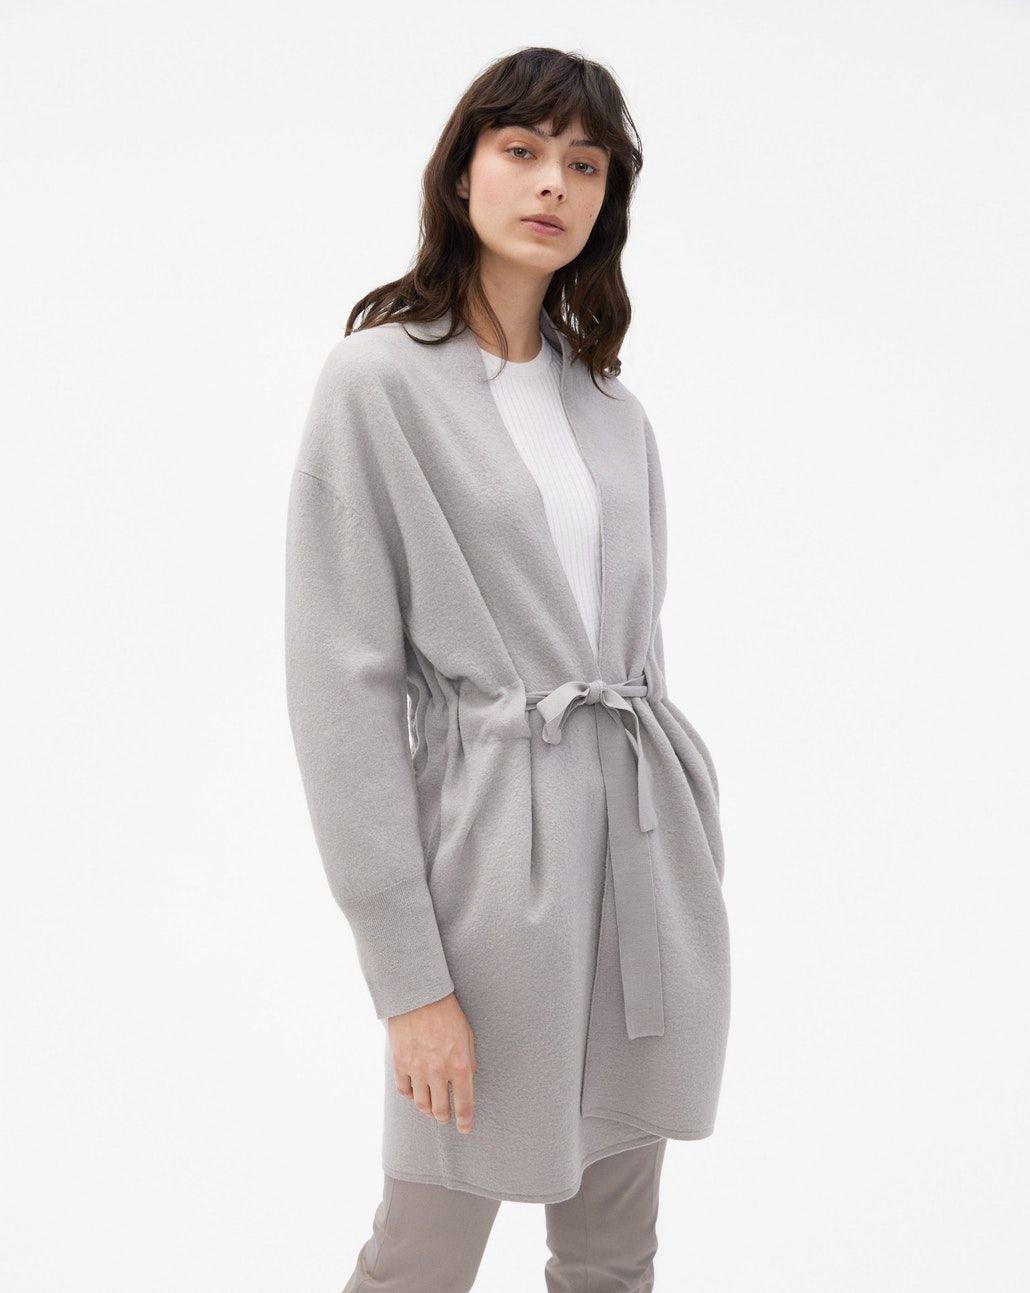 314f5d00 Boiled Wool Coat Cardigan Taupe - New Arrivals - Woman - Filippa K ...